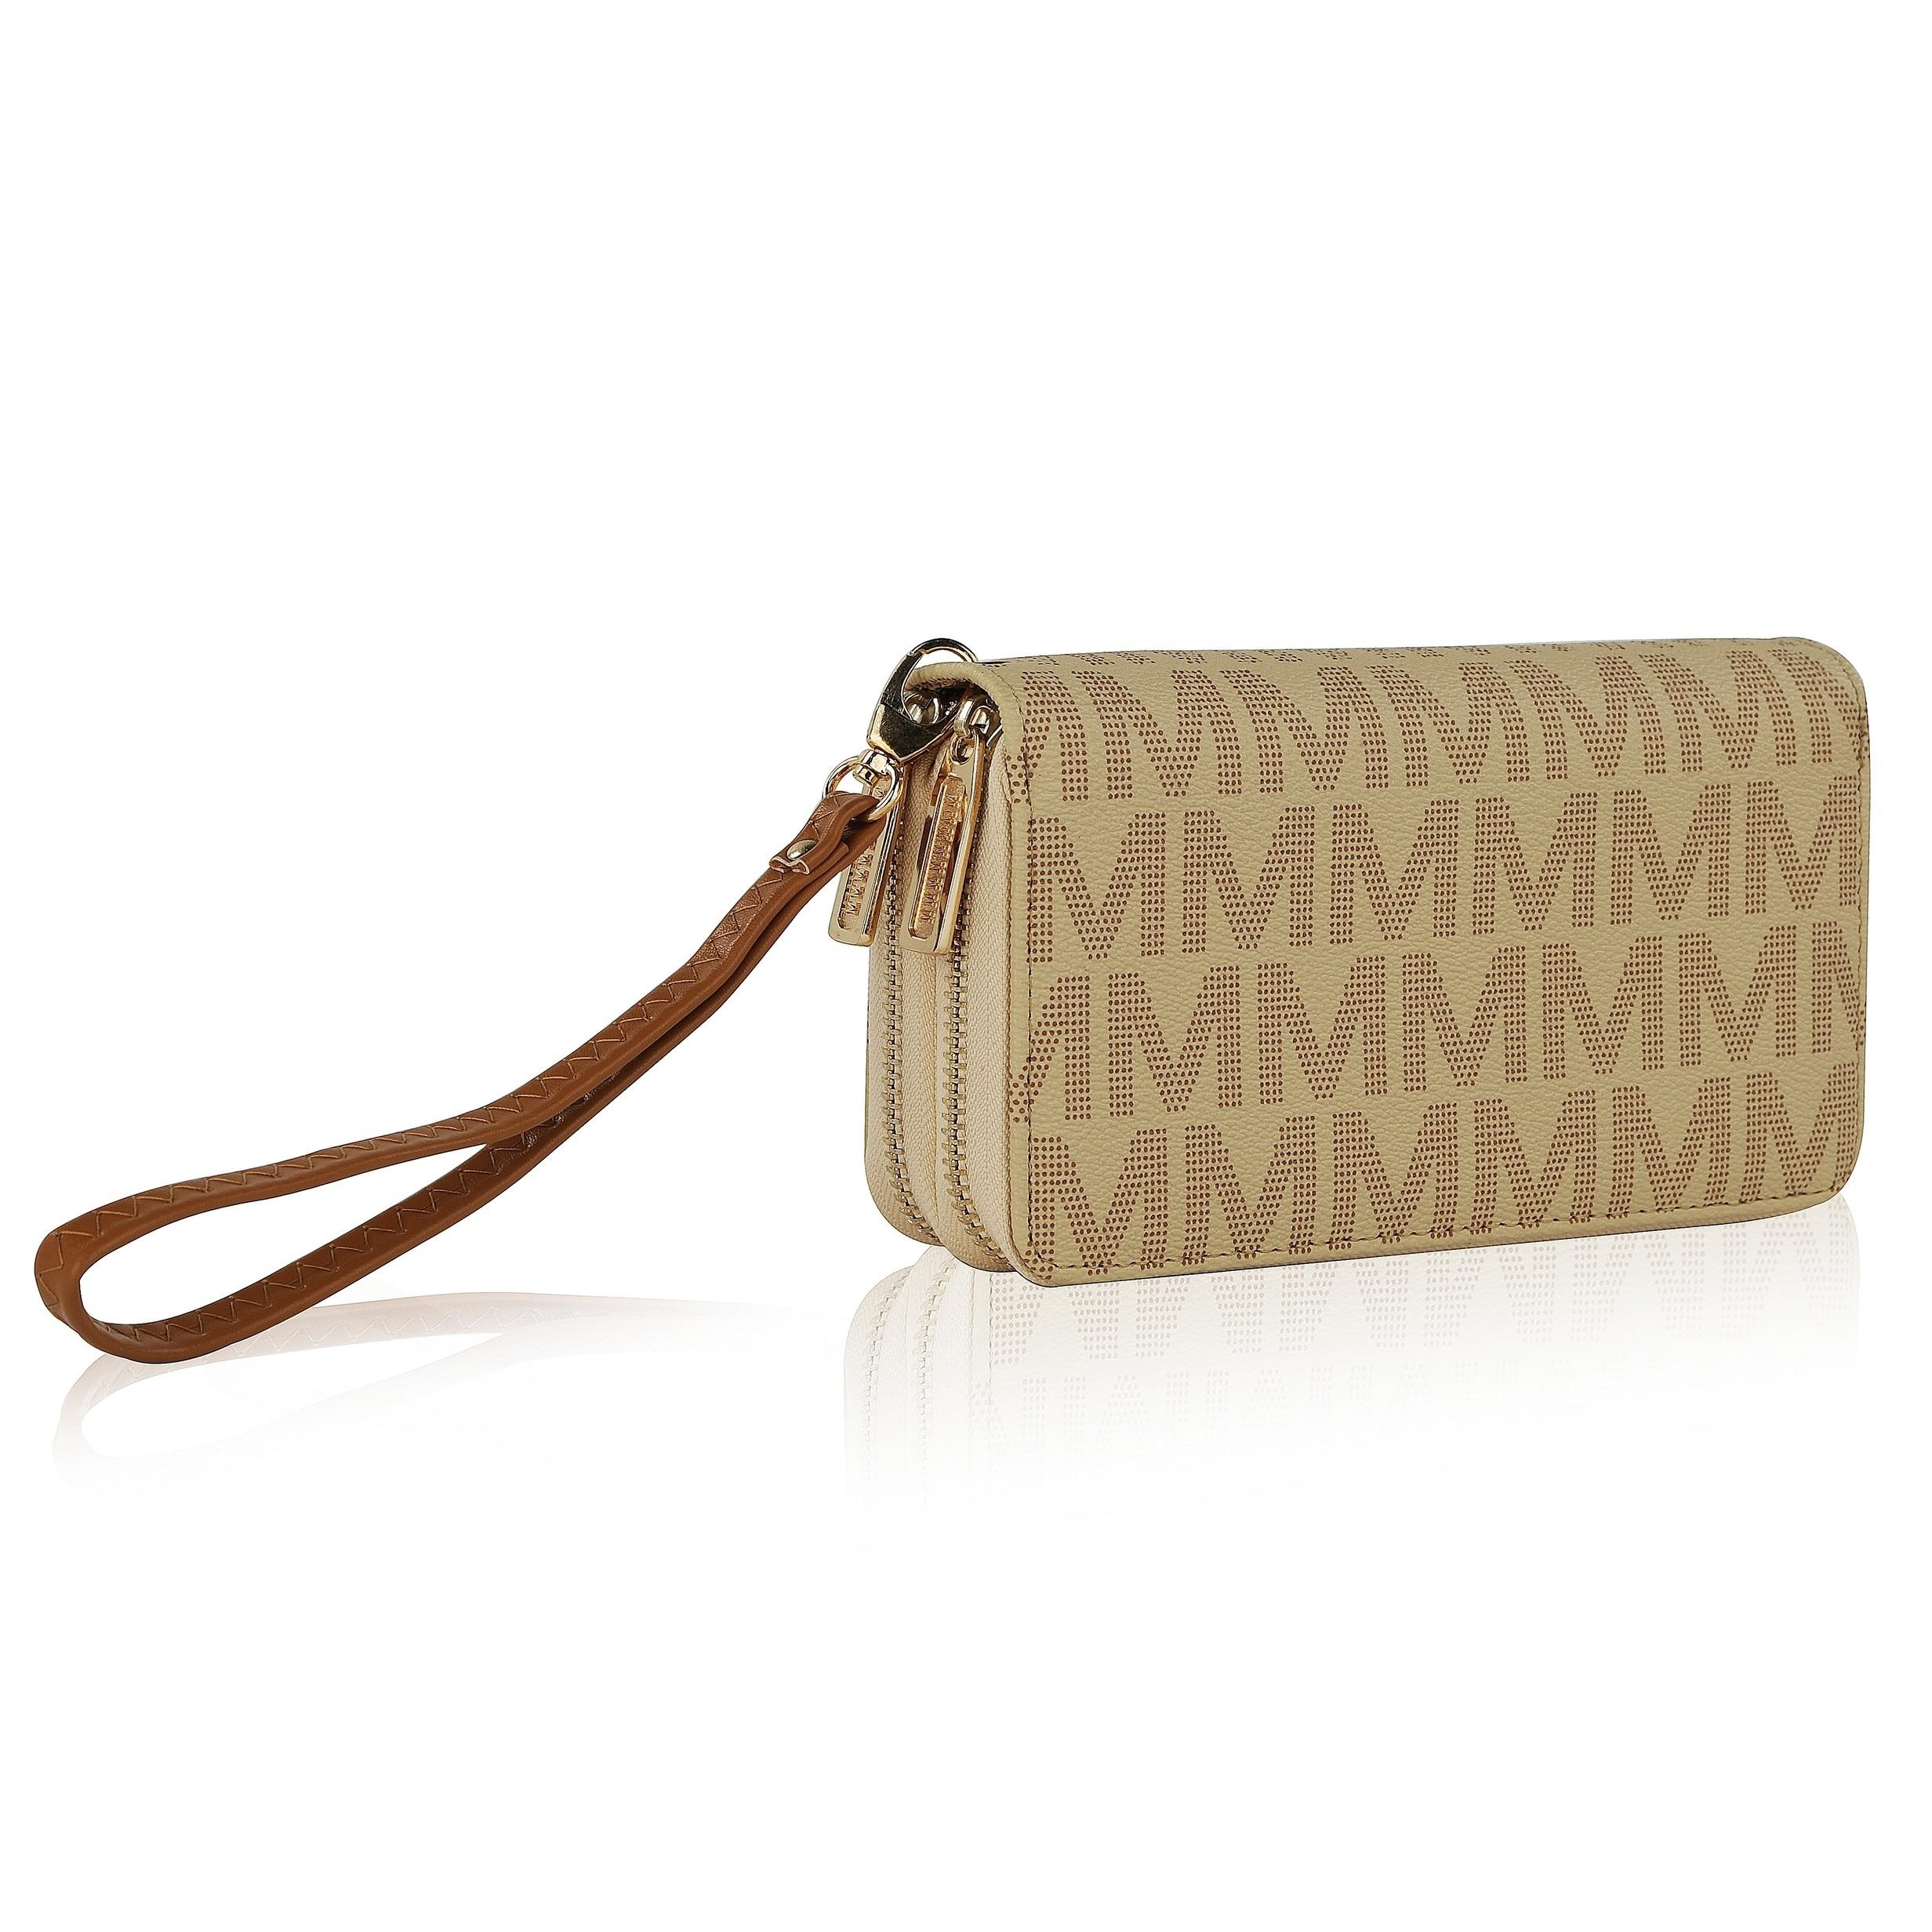 e5e9d6c7b5d1 Buy Beige Women's Wallets Online at Overstock | Our Best Wallets Deals